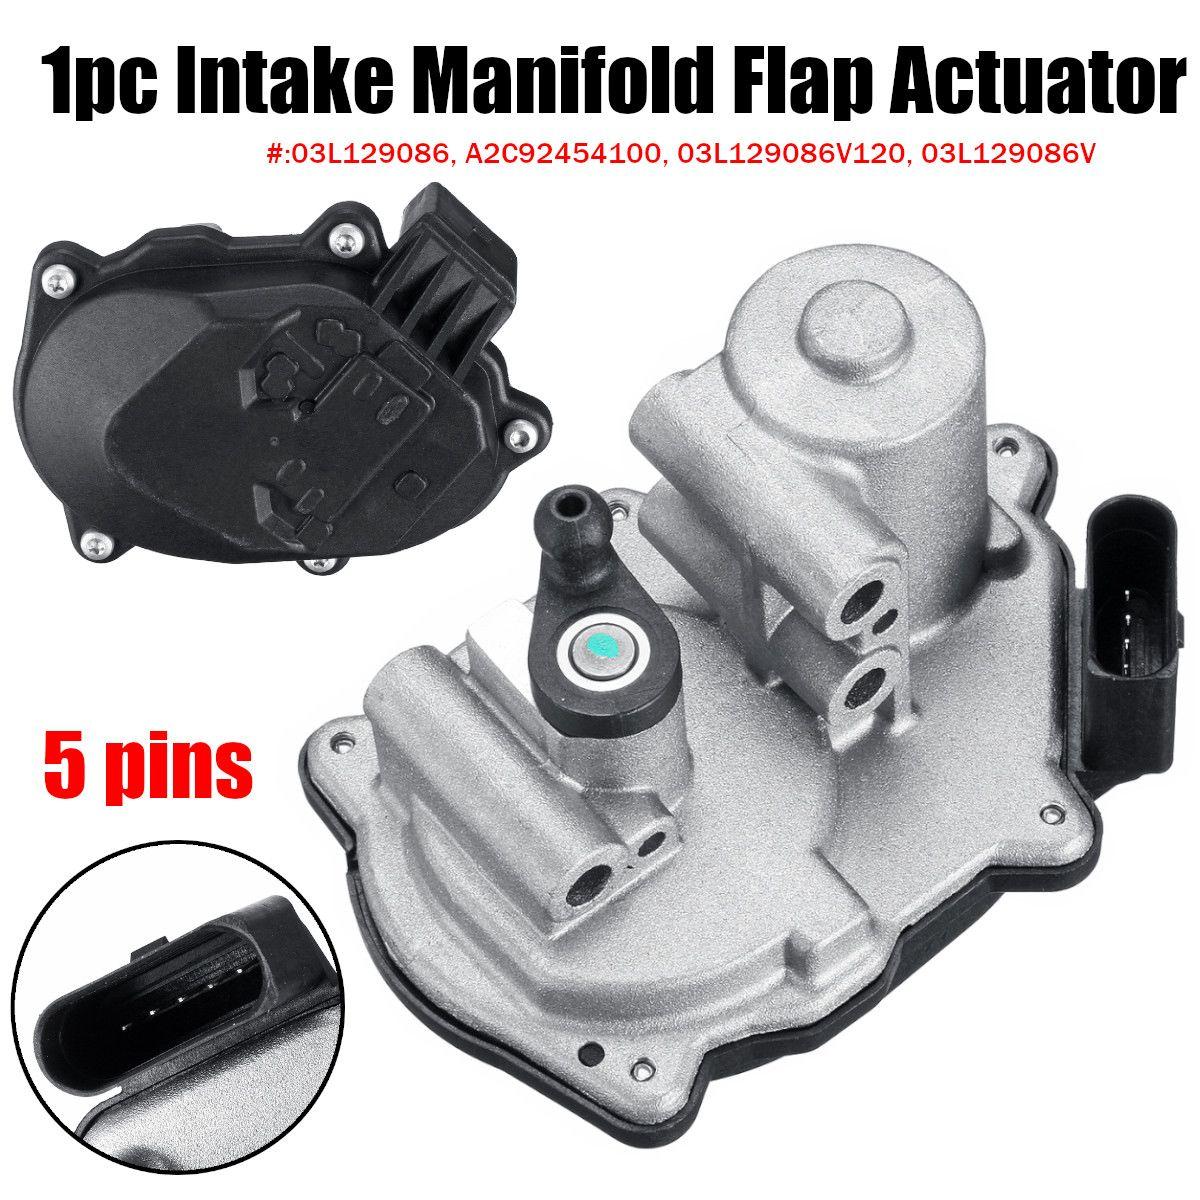 Intake Manifold Flap Actuator 03L129086 A2C92454100 03L129086V120 for VW Golf for AUDI A4 A5 A6 Q5 TT 2.0 TDI